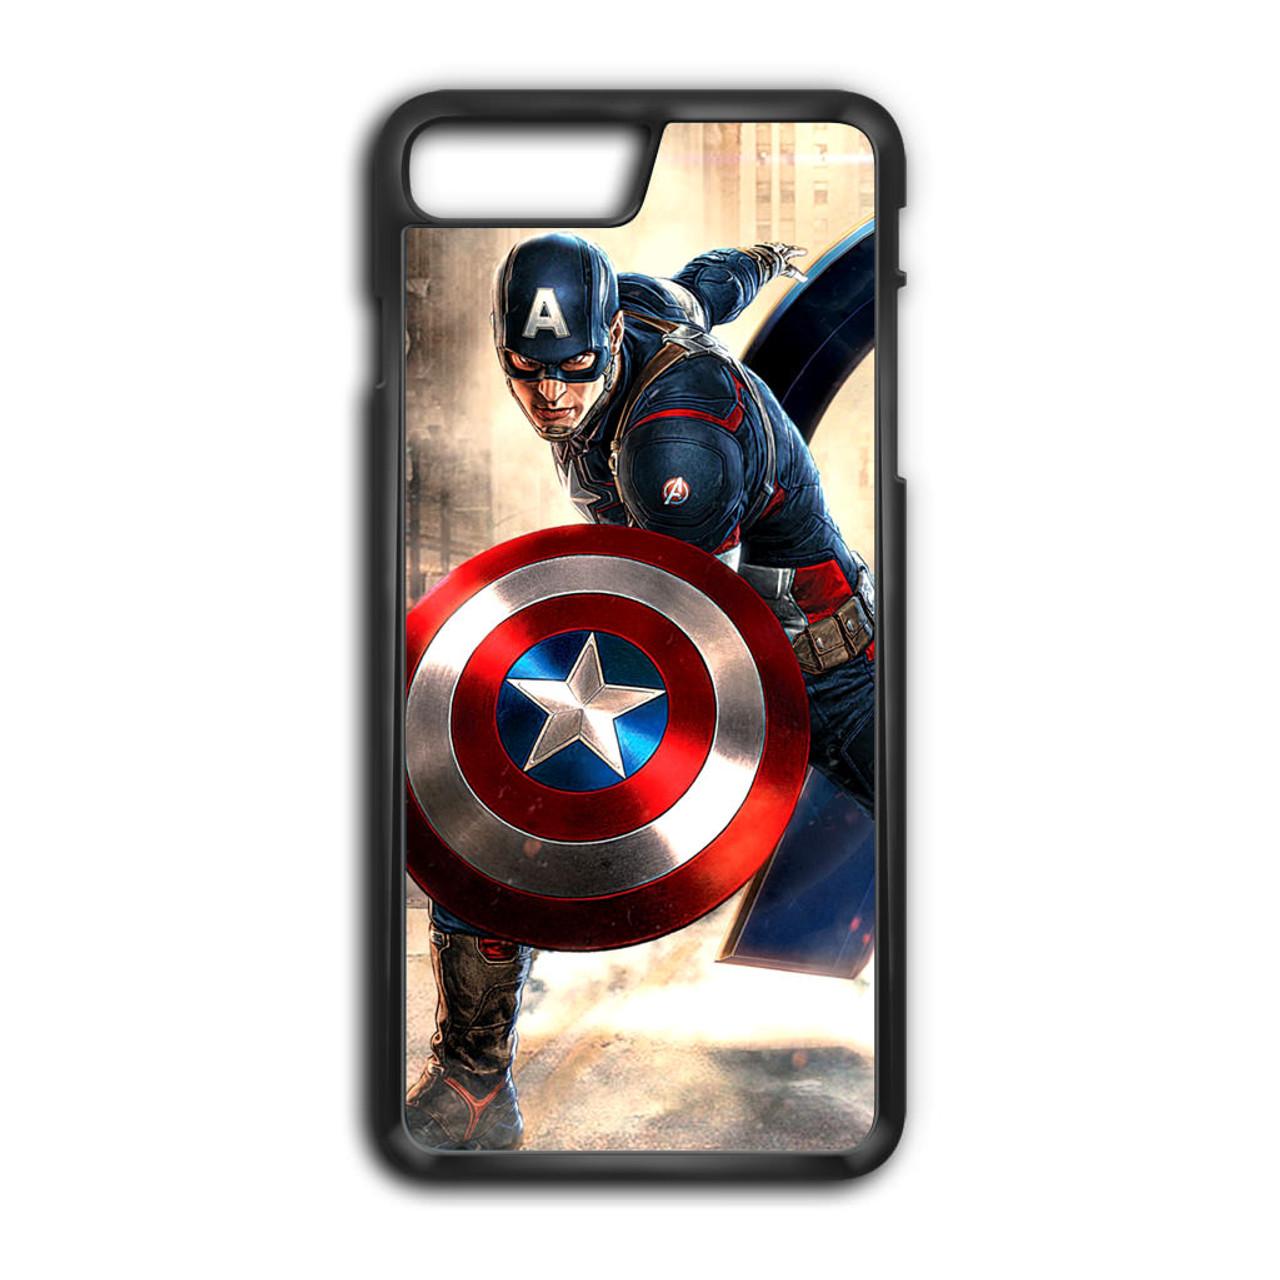 low priced 2d4fa 603ae Captain America Avengers iPhone 8 Plus Case